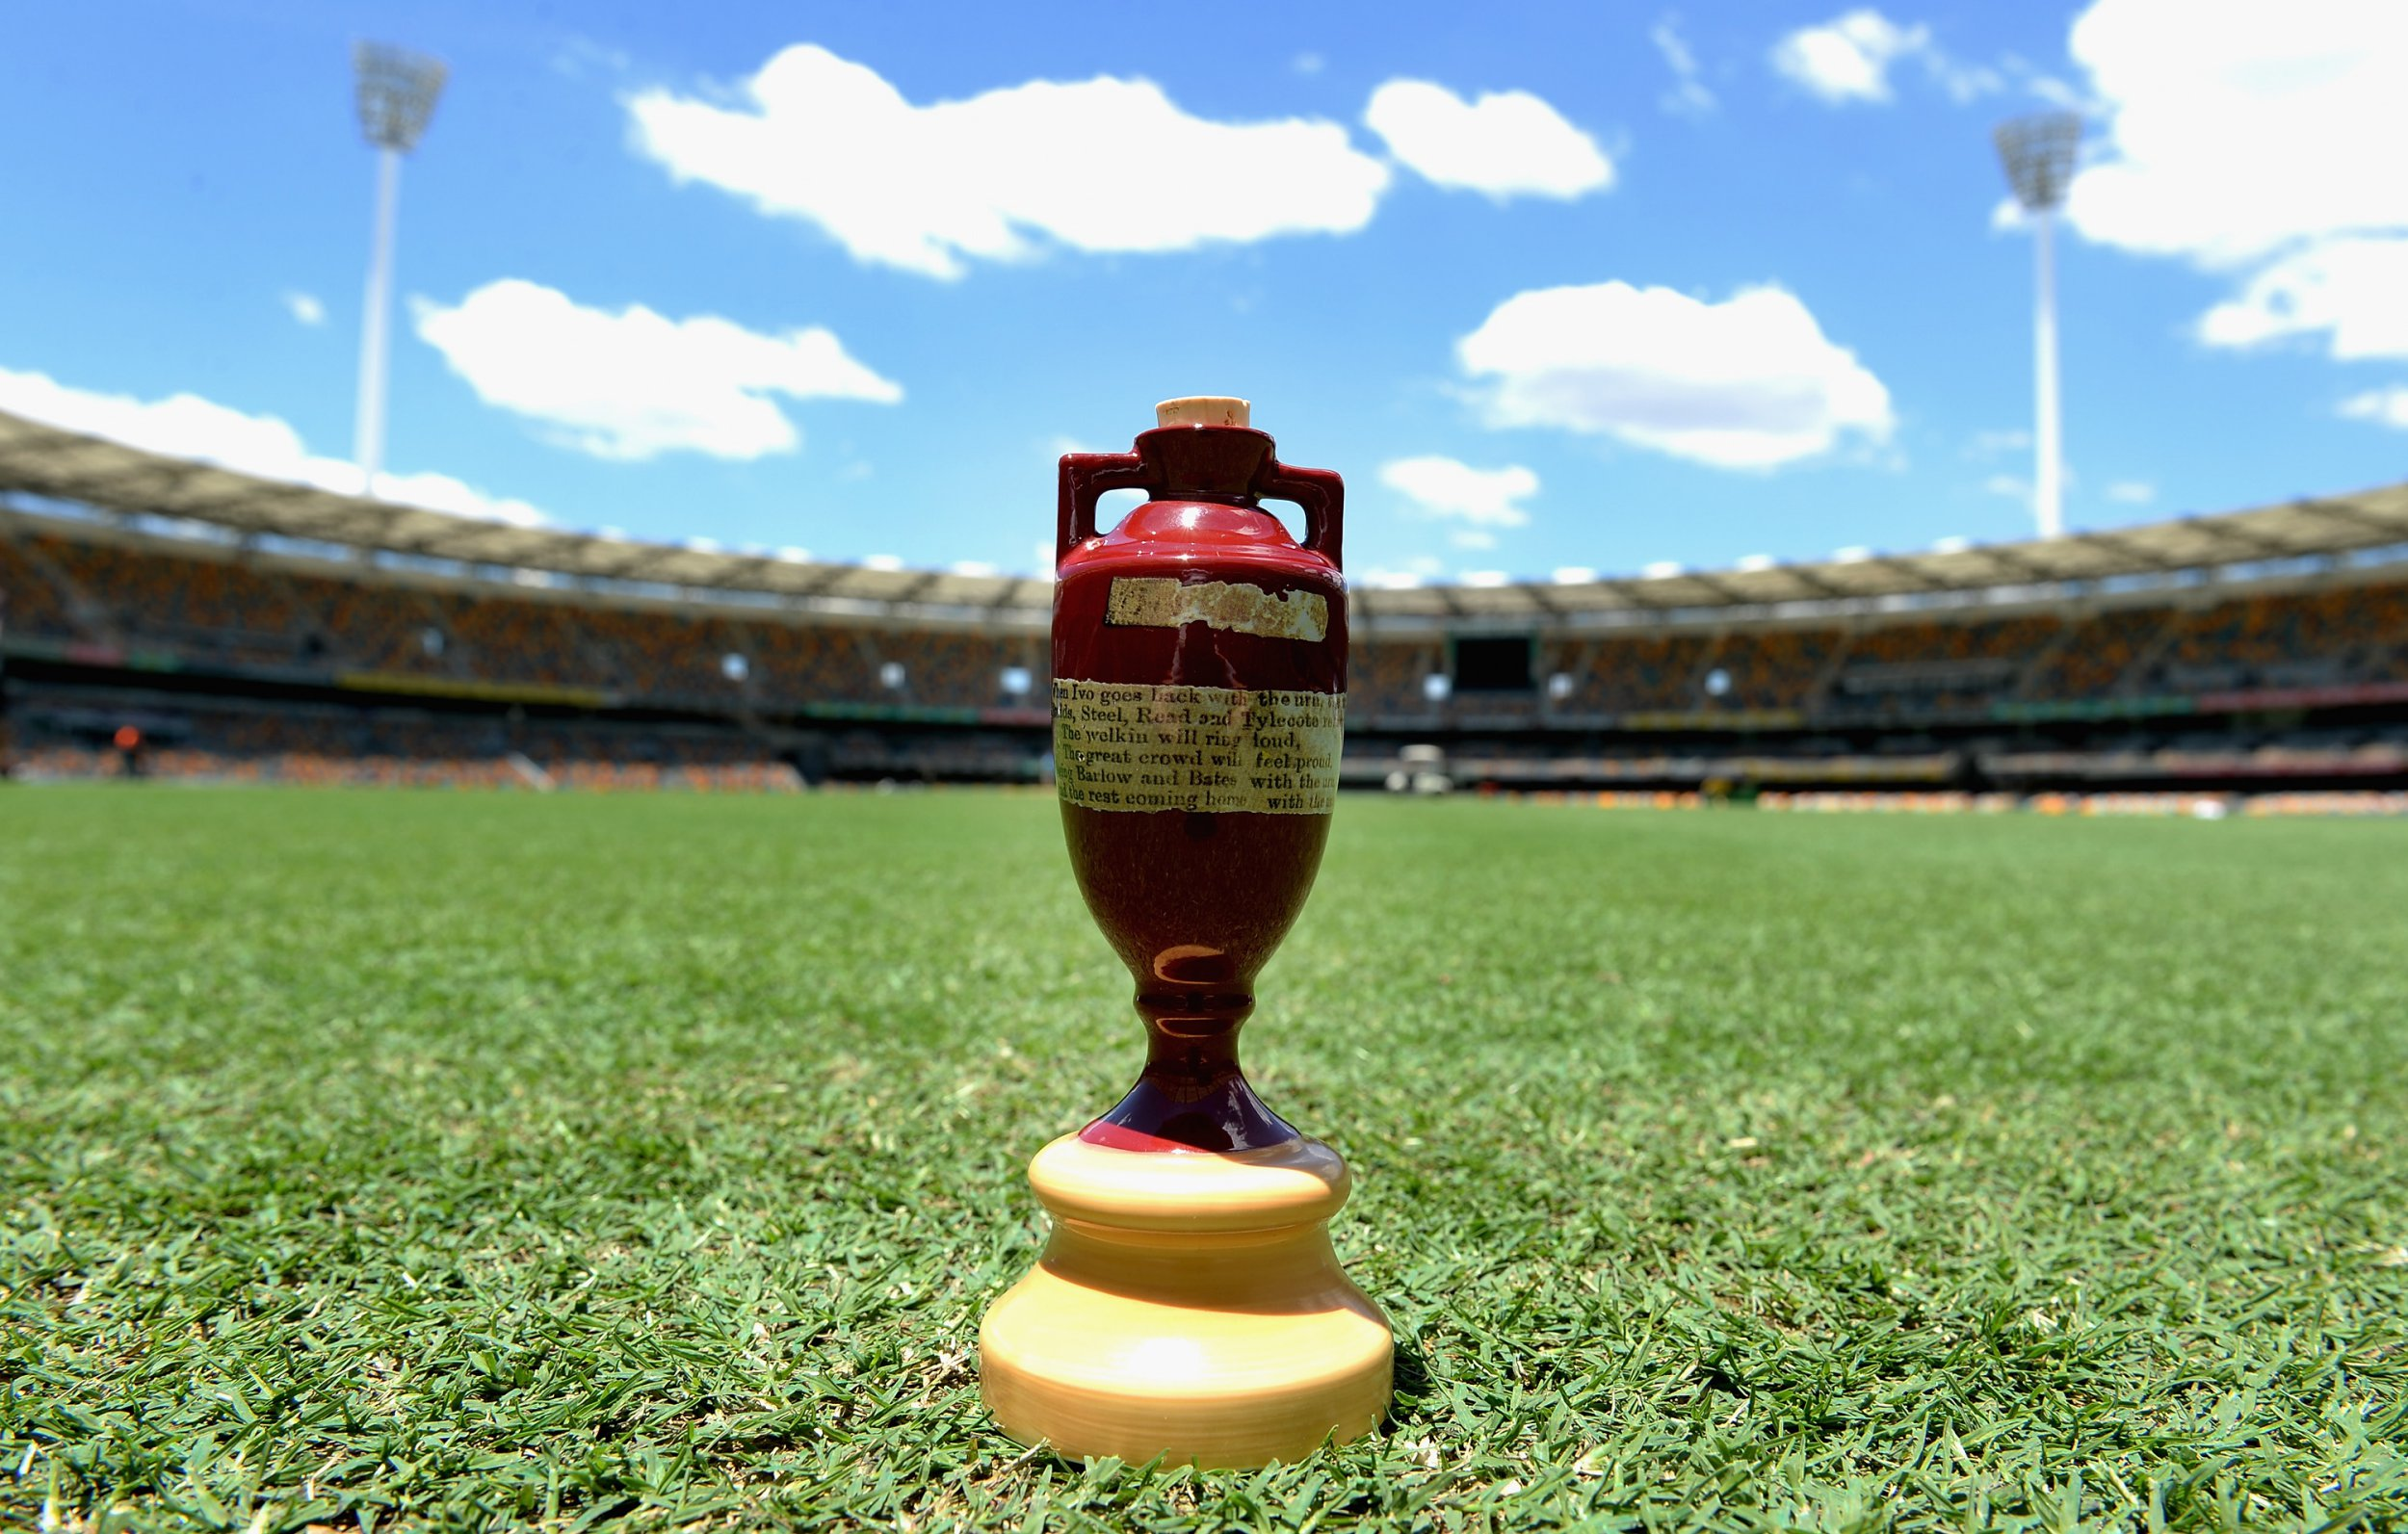 Ben Stokes named in England squad for the Ashes tour of Australia despite arrest